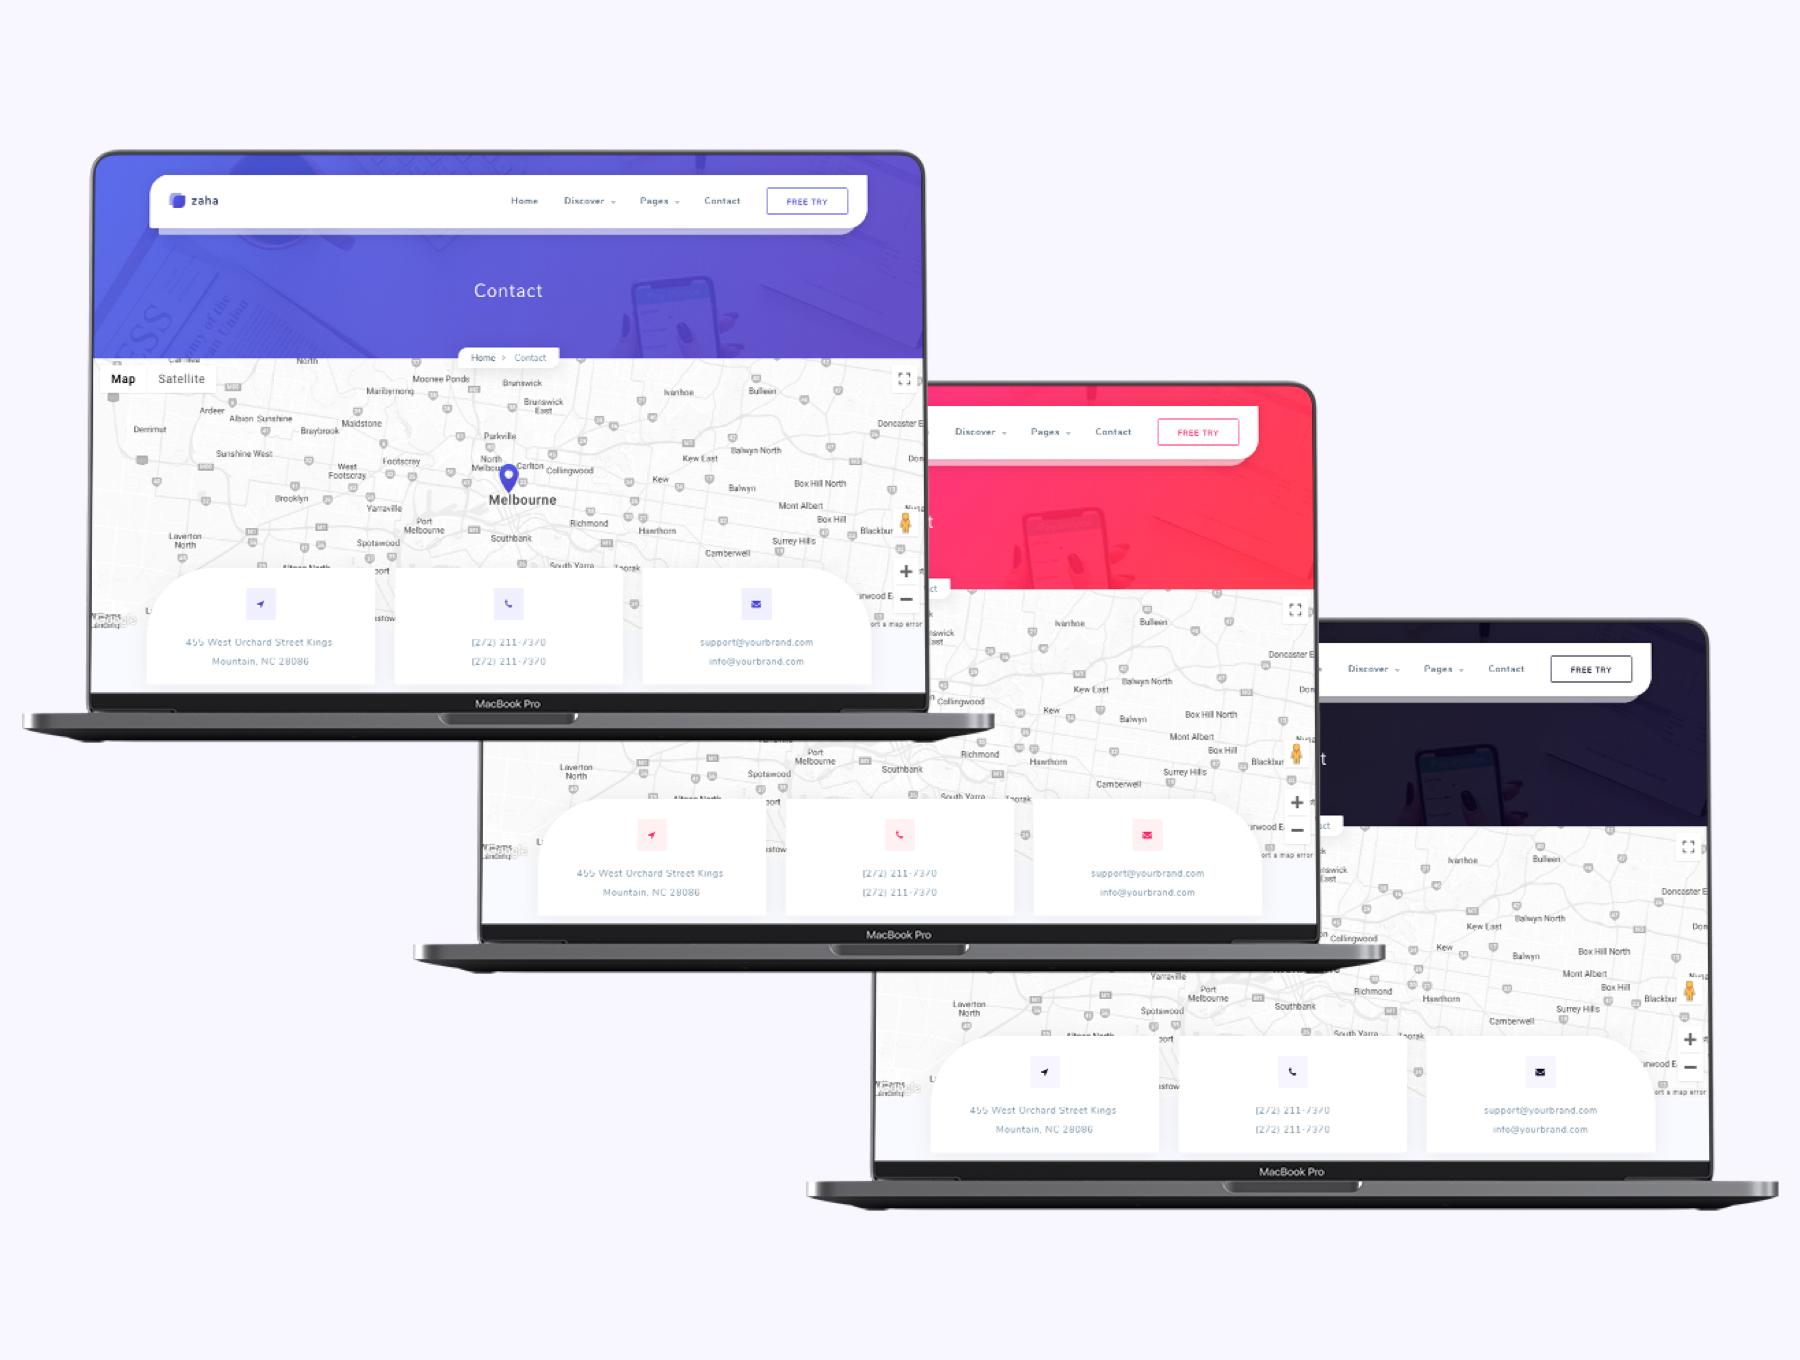 高质量代理和SaaS平台web网页模板ui素材Zaha - Agency and SaaS HTML5 Template